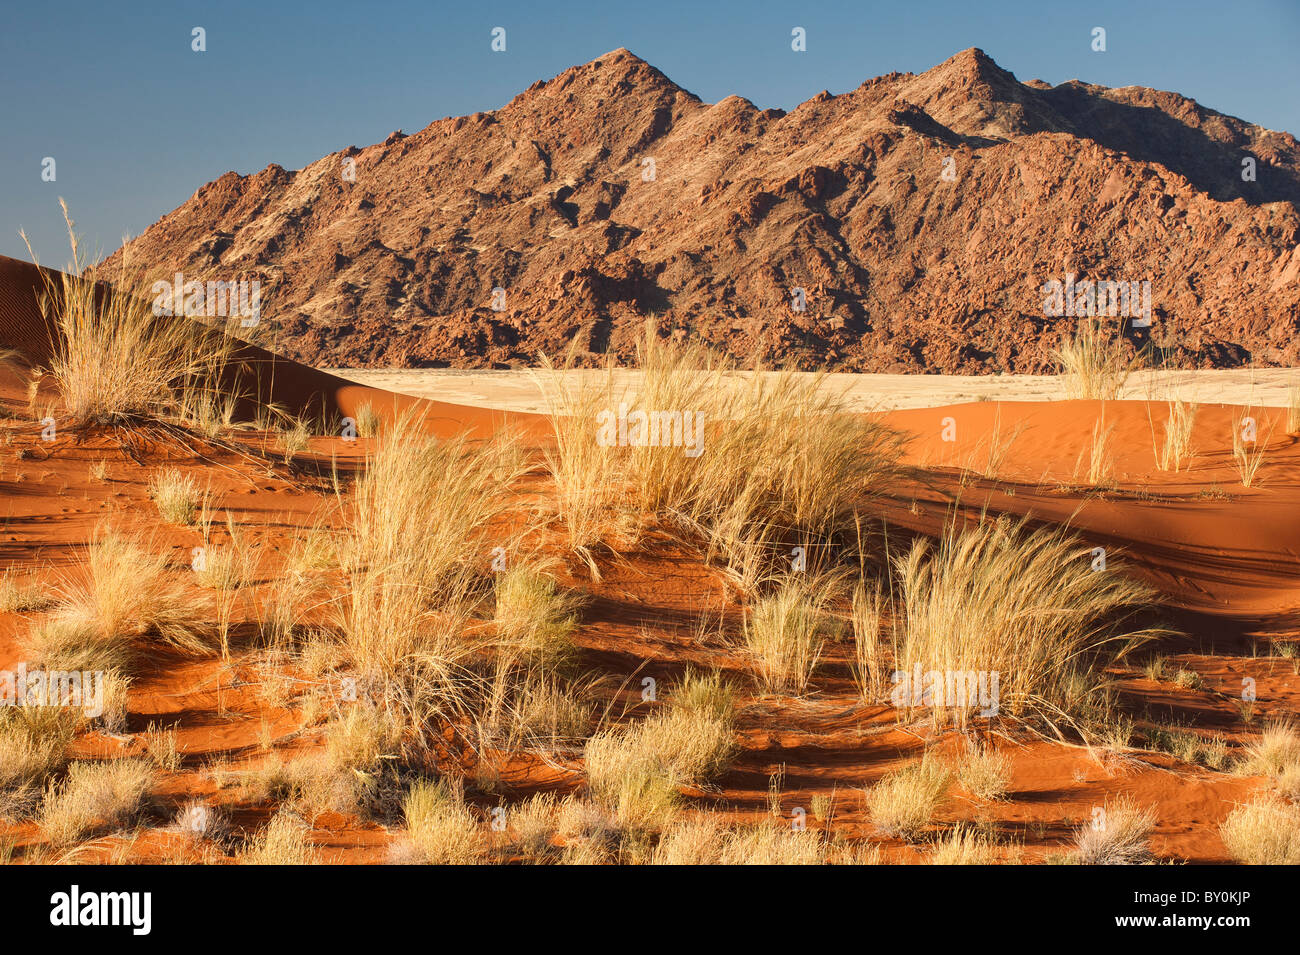 Naukluft Mountains (Naukluftberge) in central Namibia. - Stock Image